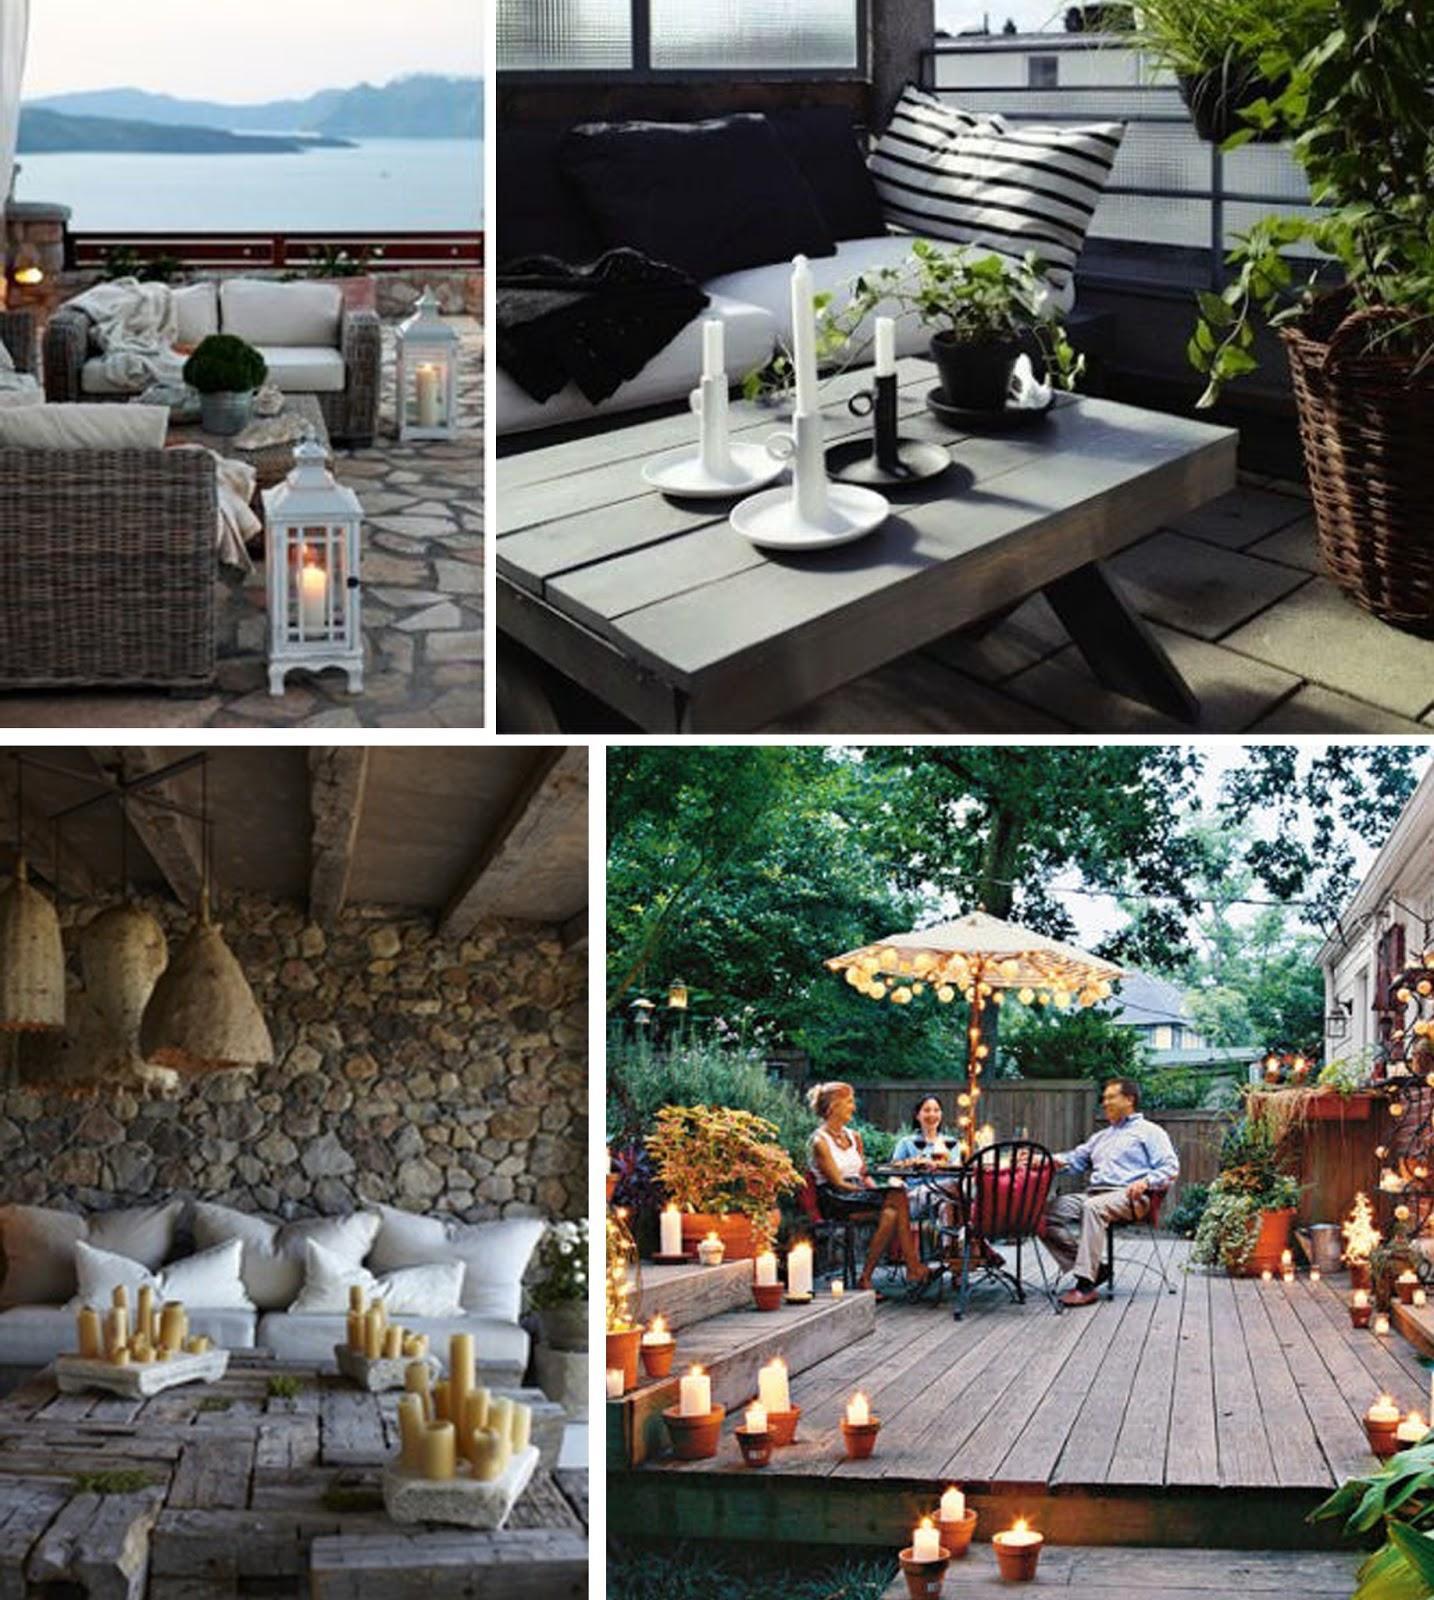 Decoraci n jardines y terrazas paperblog - Decoracion jardines y terrazas ...